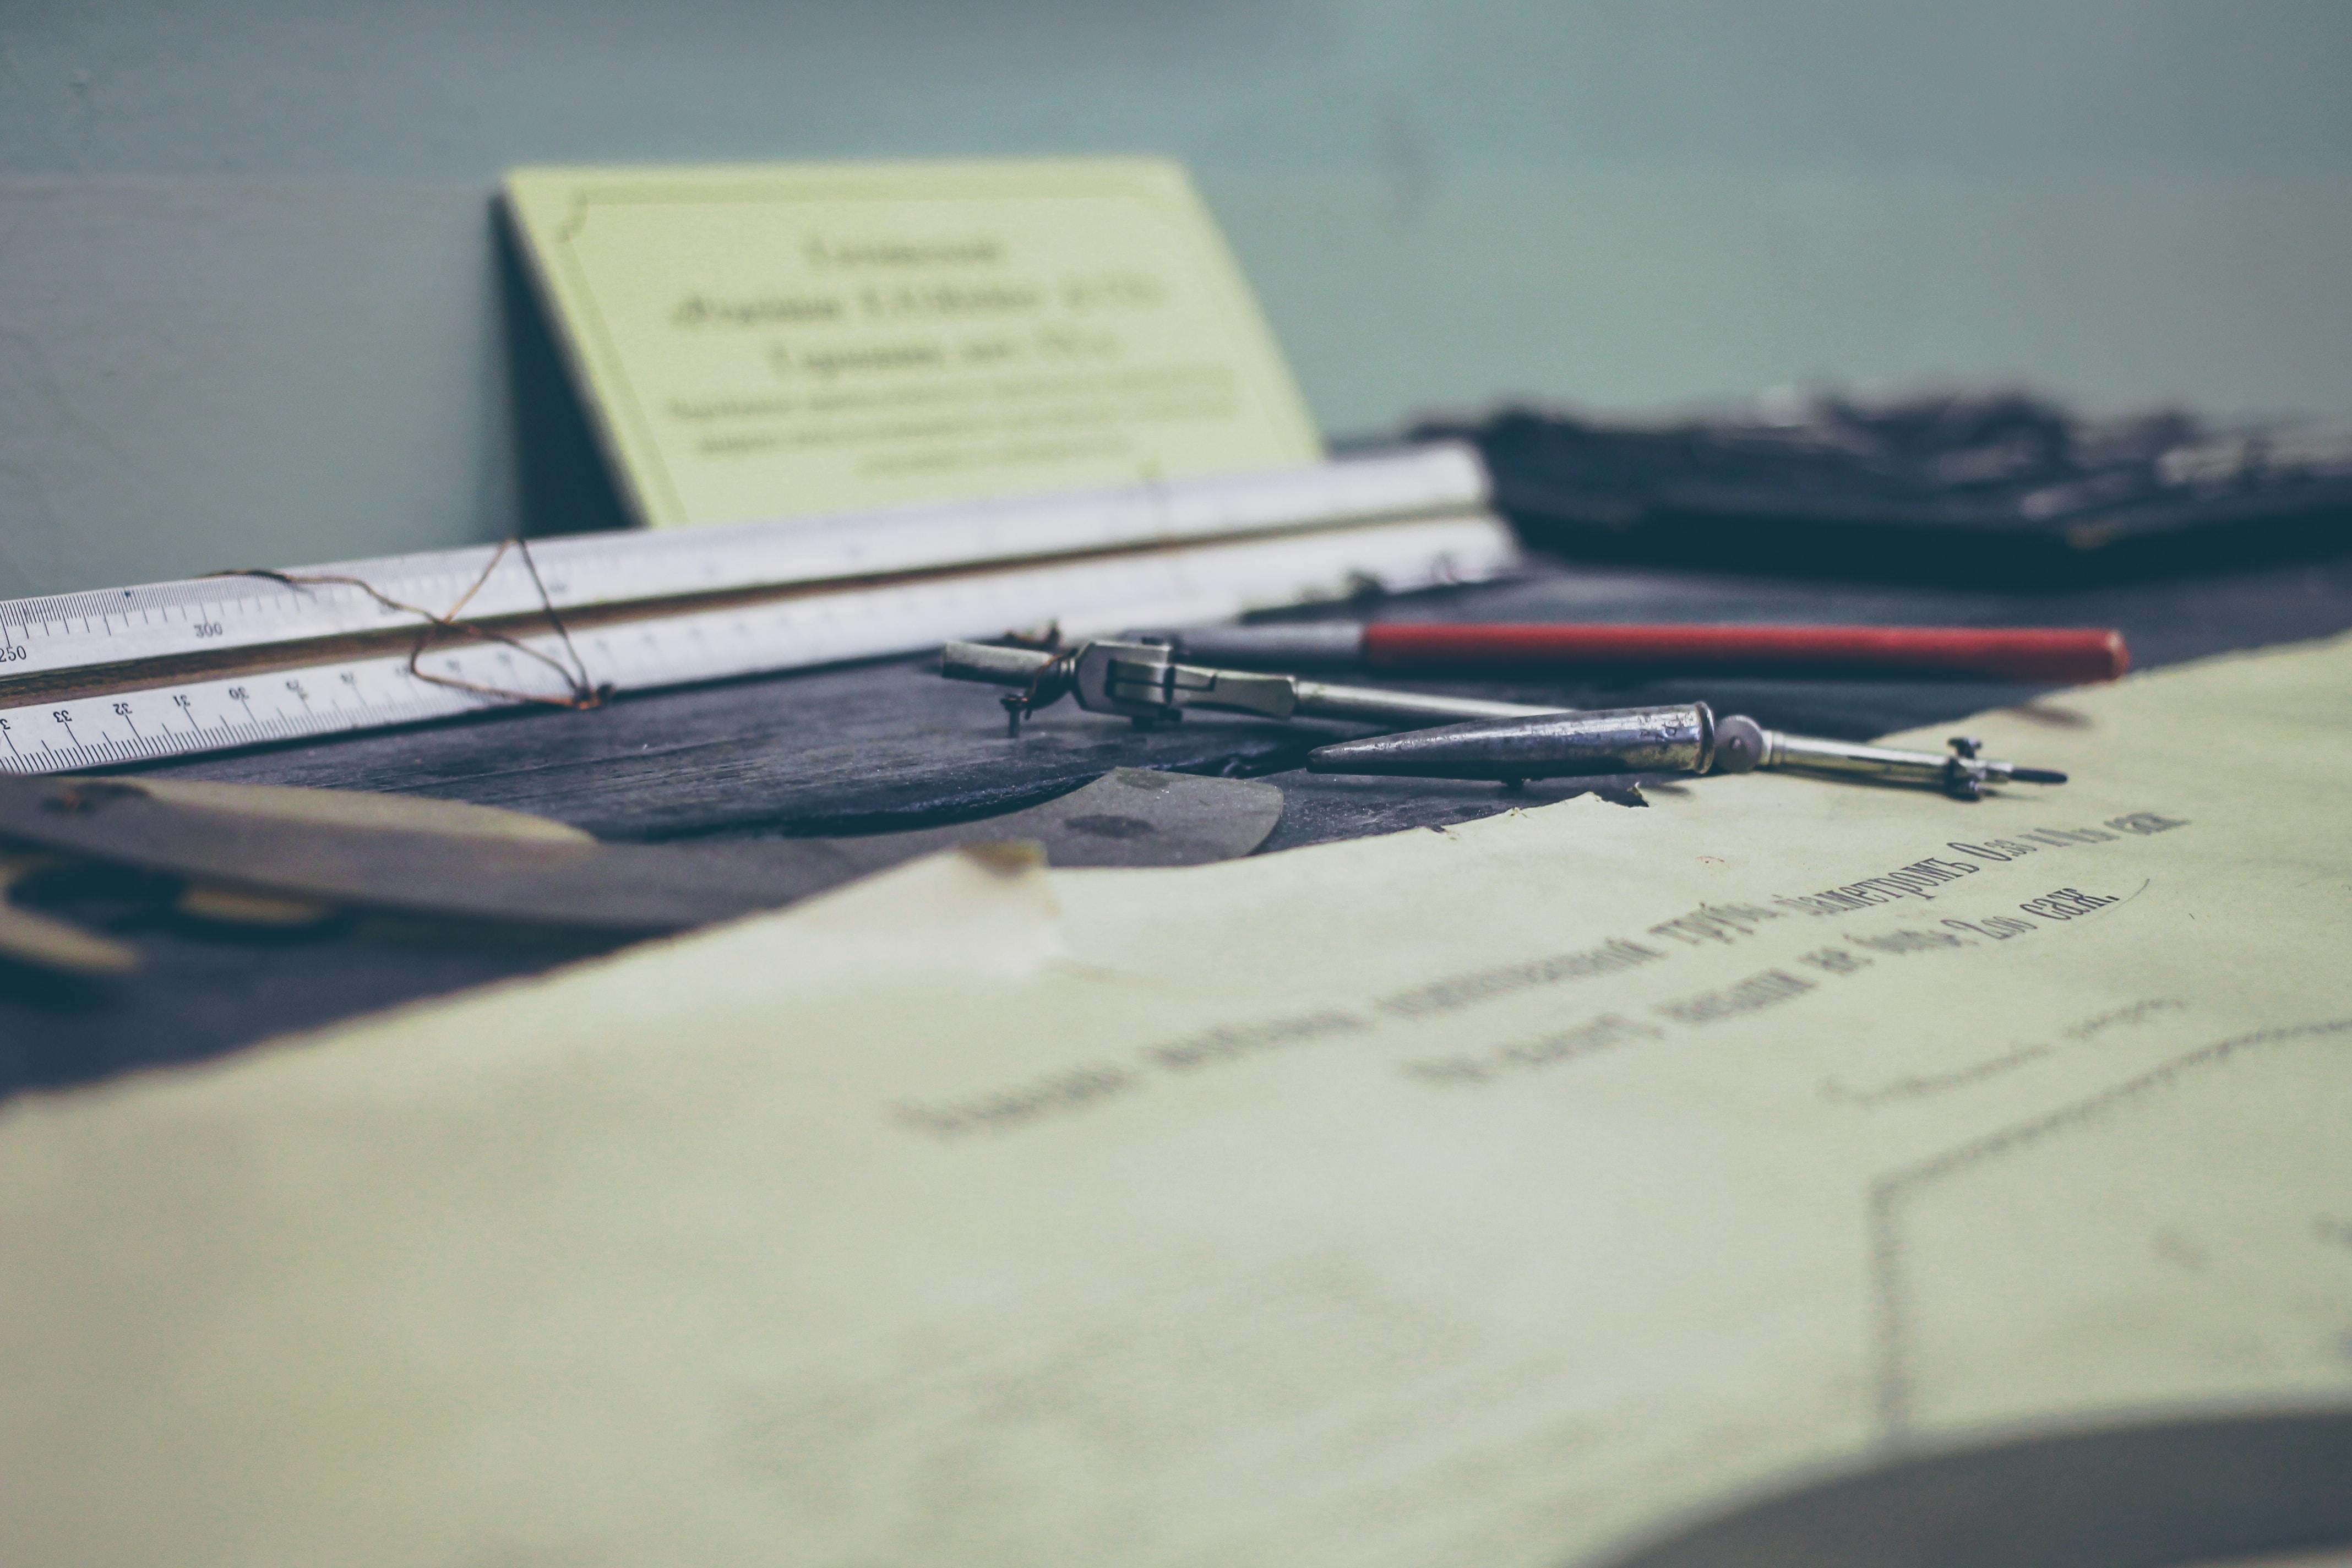 gray compass tool on table